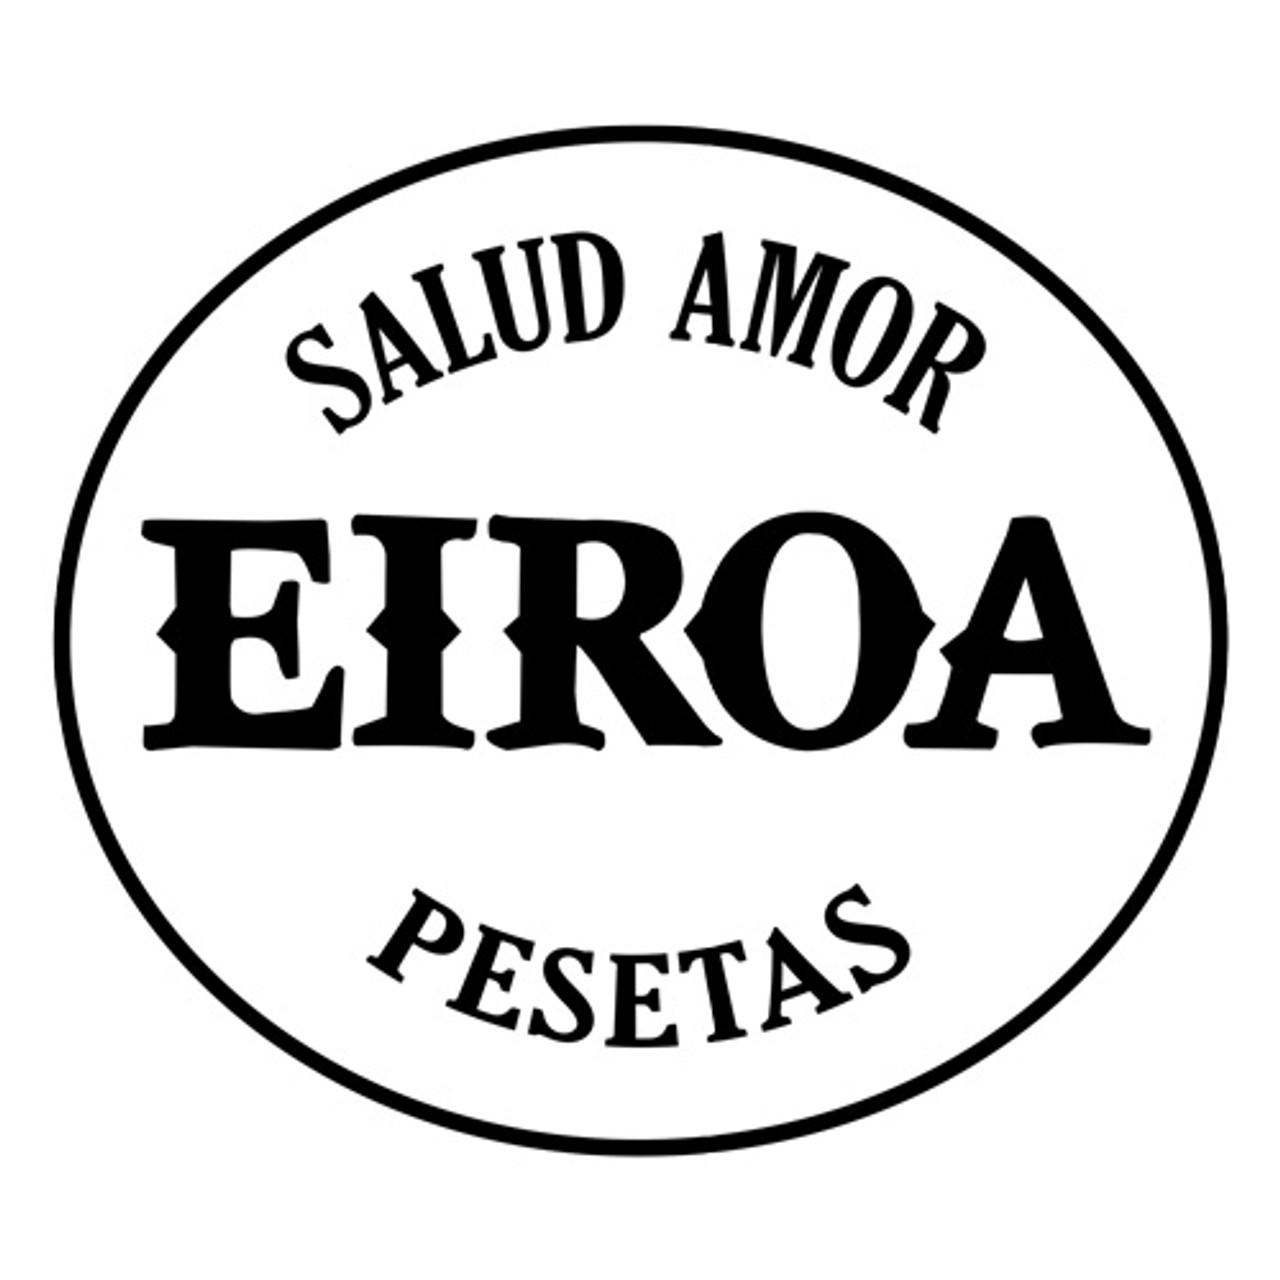 Eiroa CBT Maduro 50 X 5 Cigars - 5 x 50 (Box of 20)